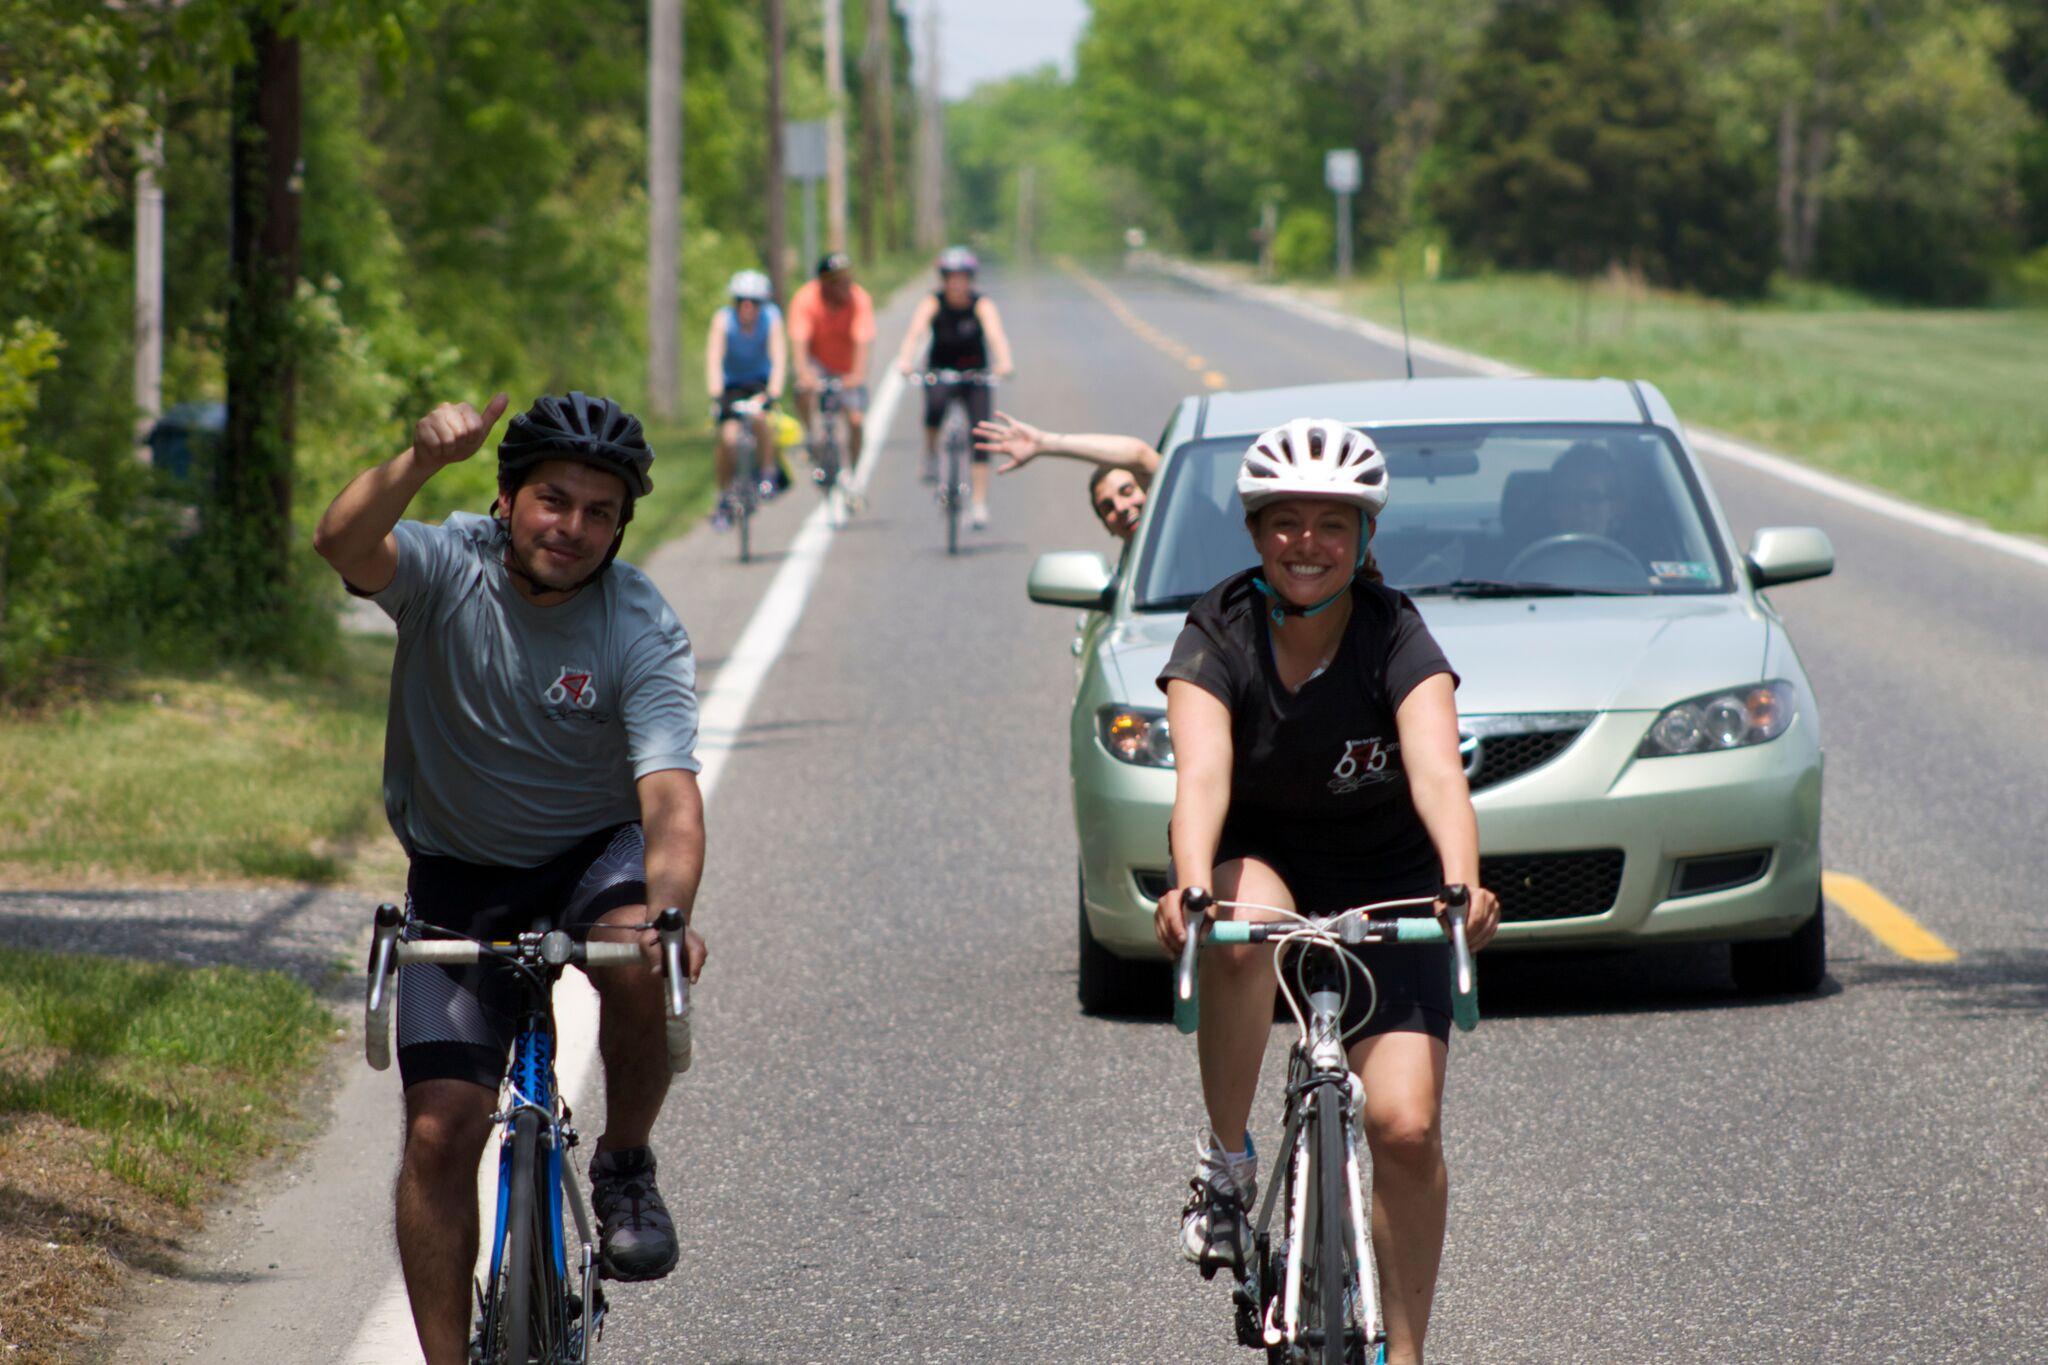 cyclists5.jpg